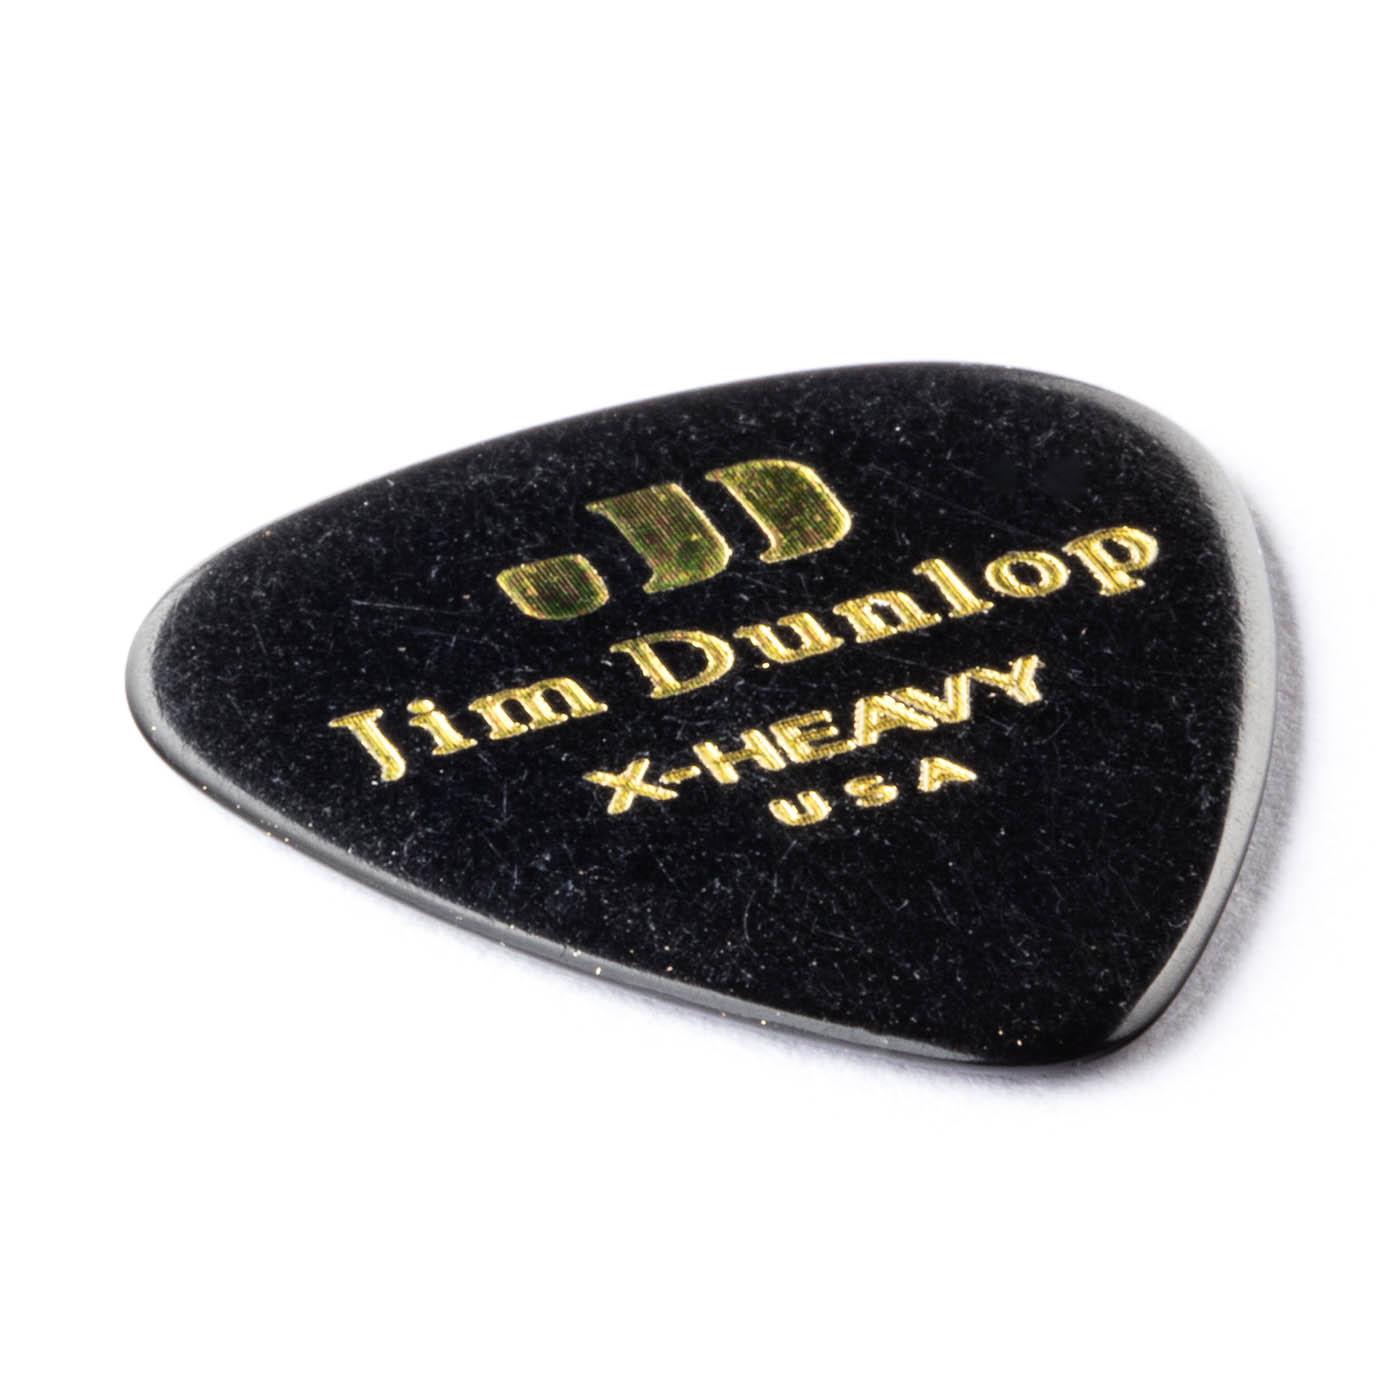 Dunlop - Black Classic extra heavy